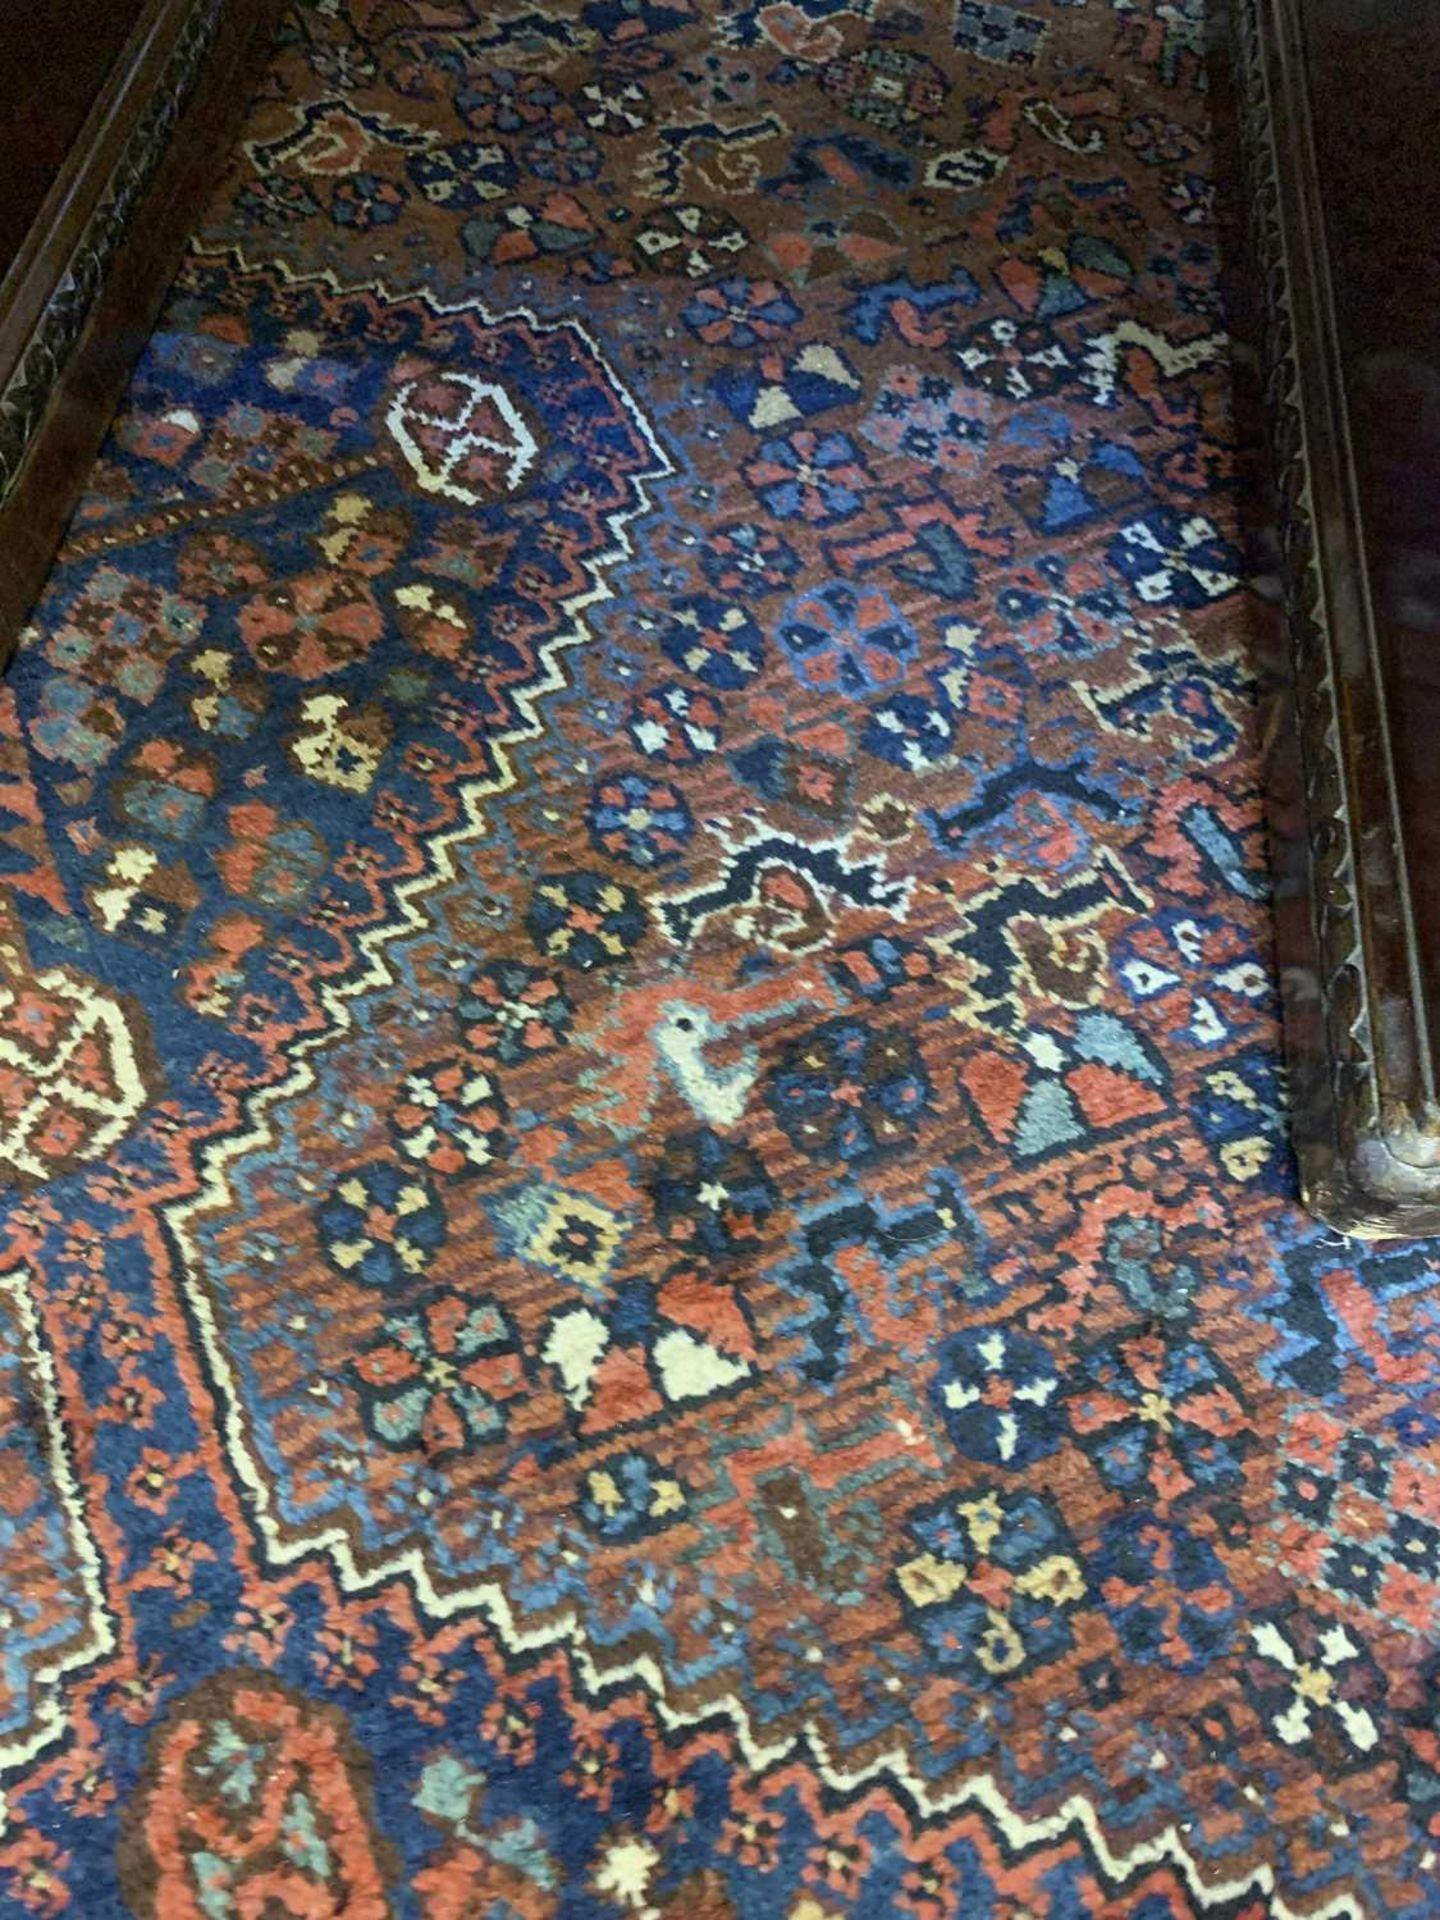 A South West Persian Khamseh carpet, - Image 10 of 17